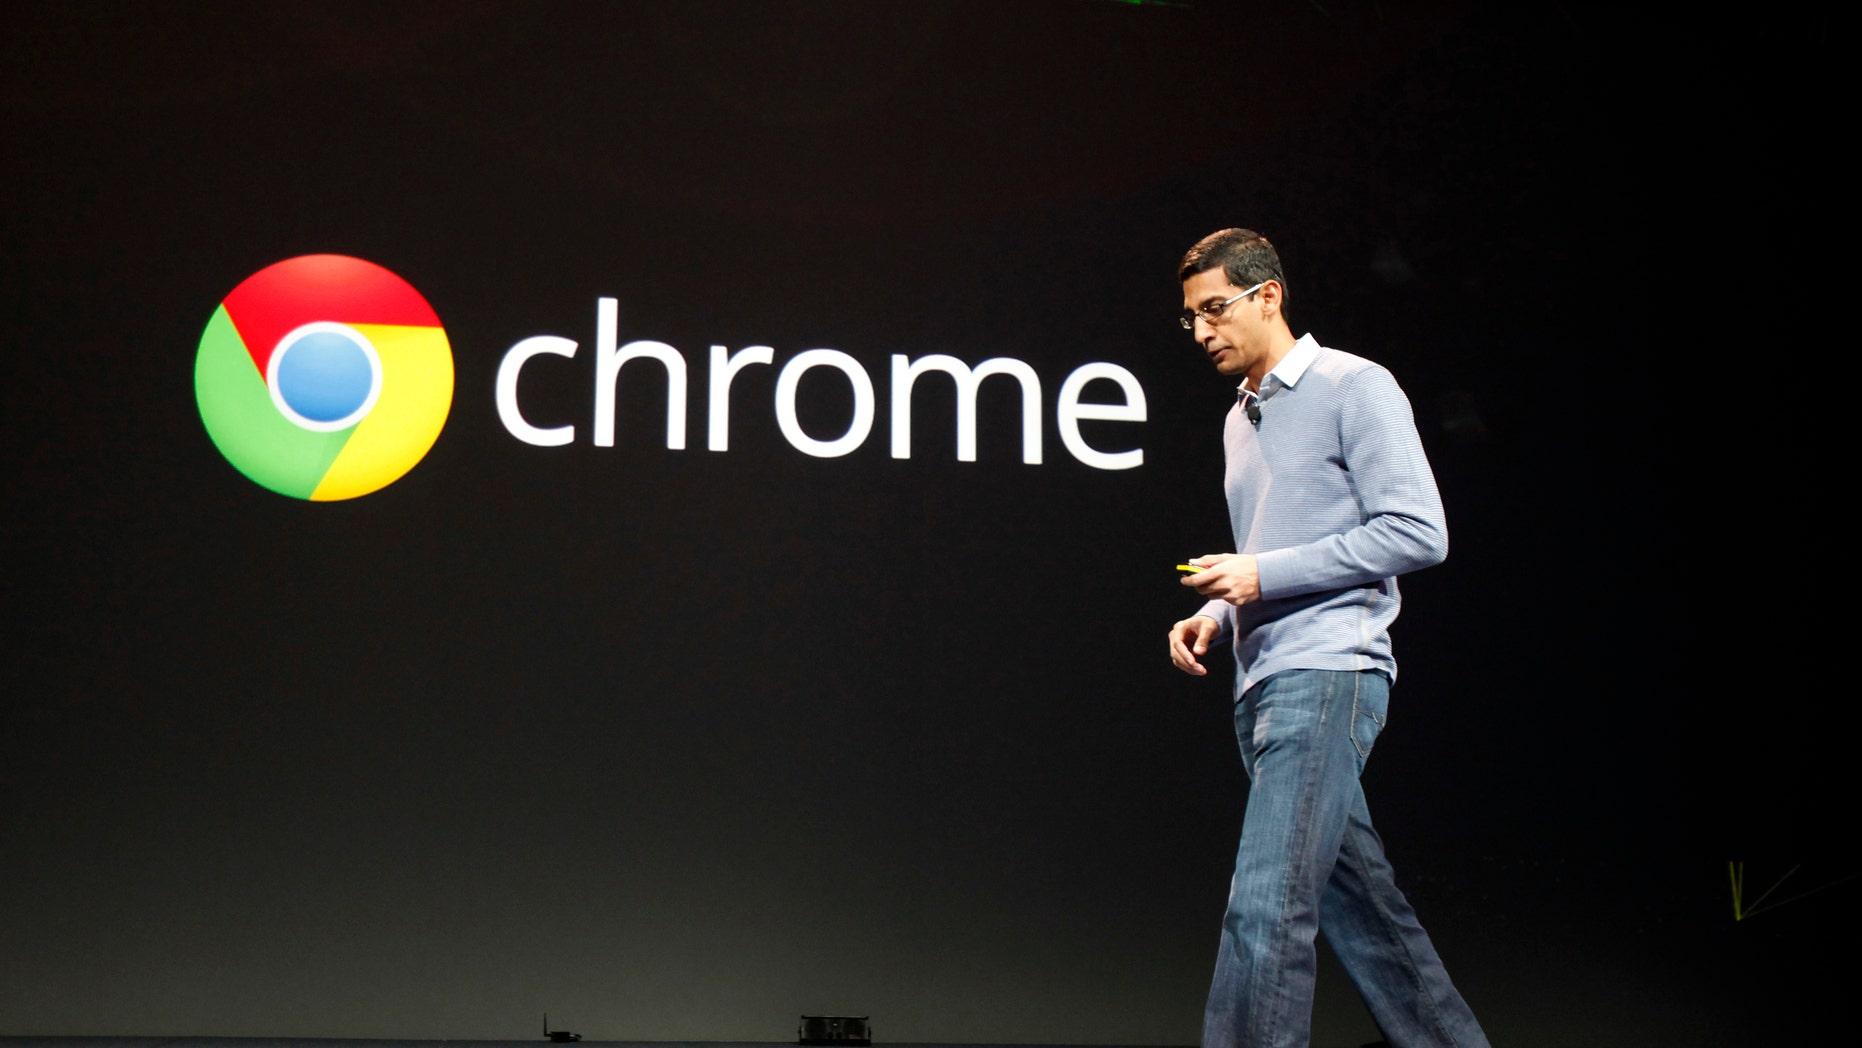 Sundar Pichai, senior vice president of Google Chrome, speaks during Google I/O Conference at Moscone Center in San Francisco.